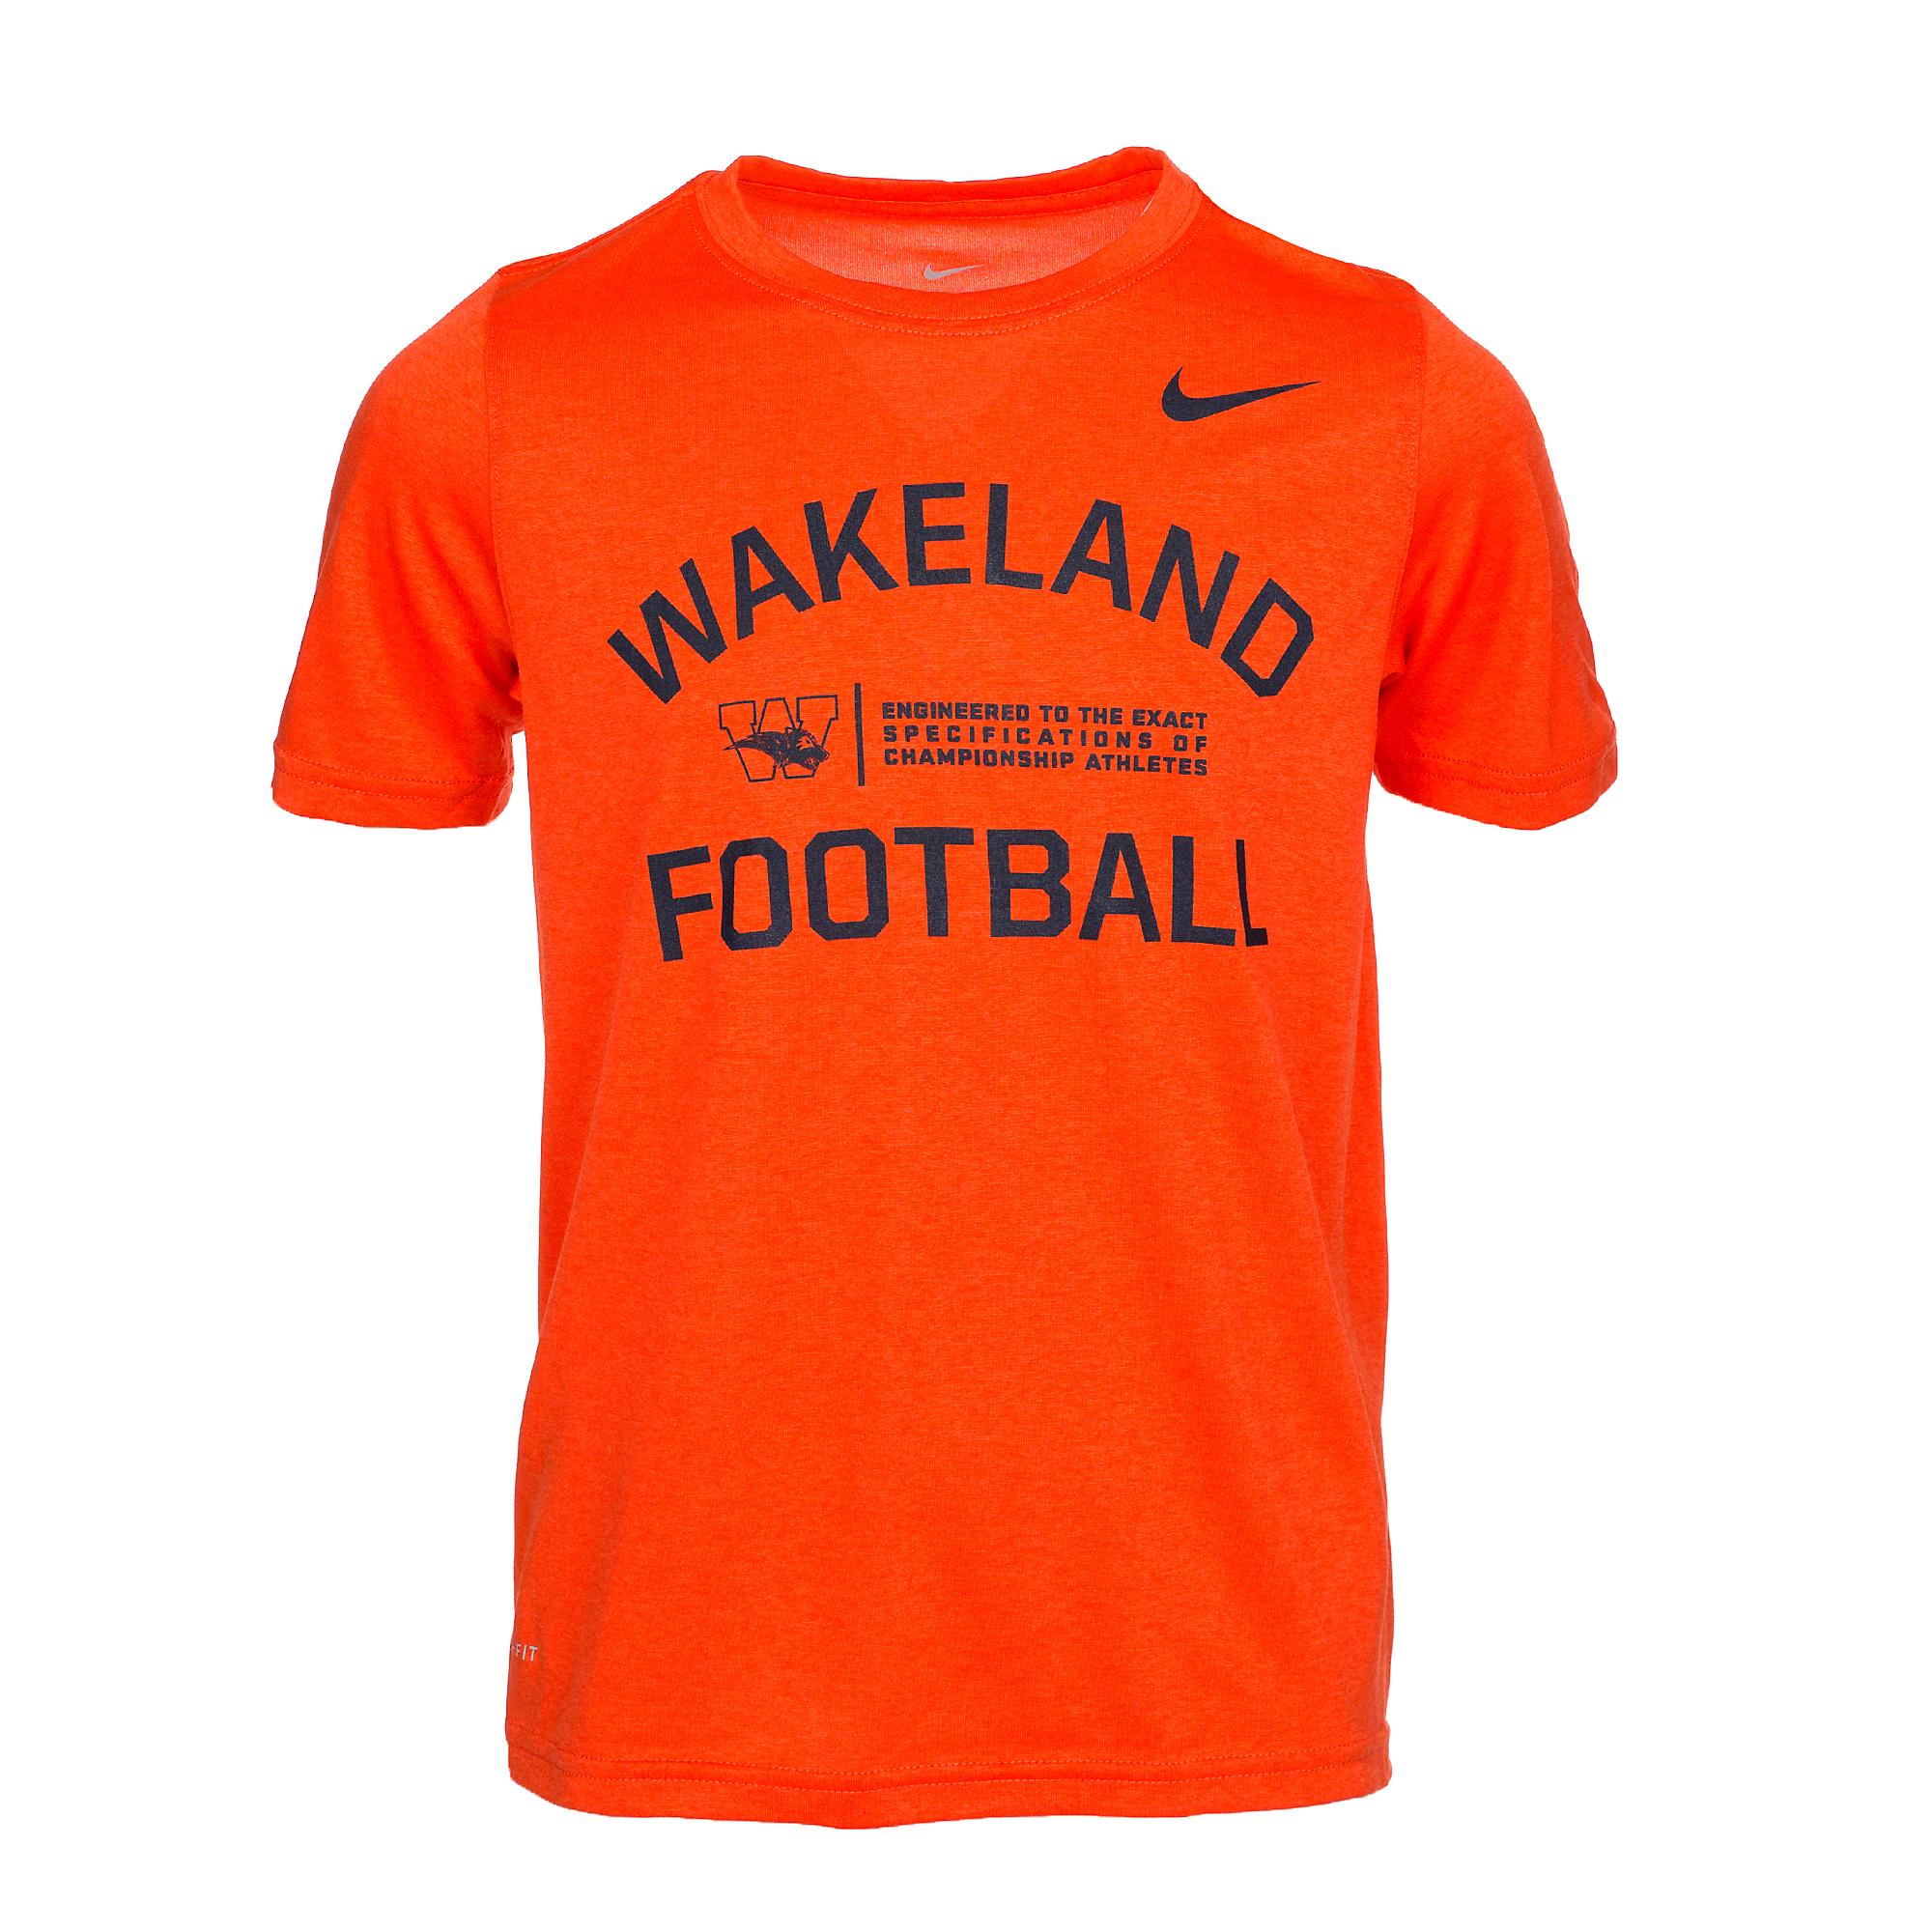 7722c0c5 Wakeland Wolverines Nike Boys Dri-Fit Legend Short Sleeve Tee | Fans ...